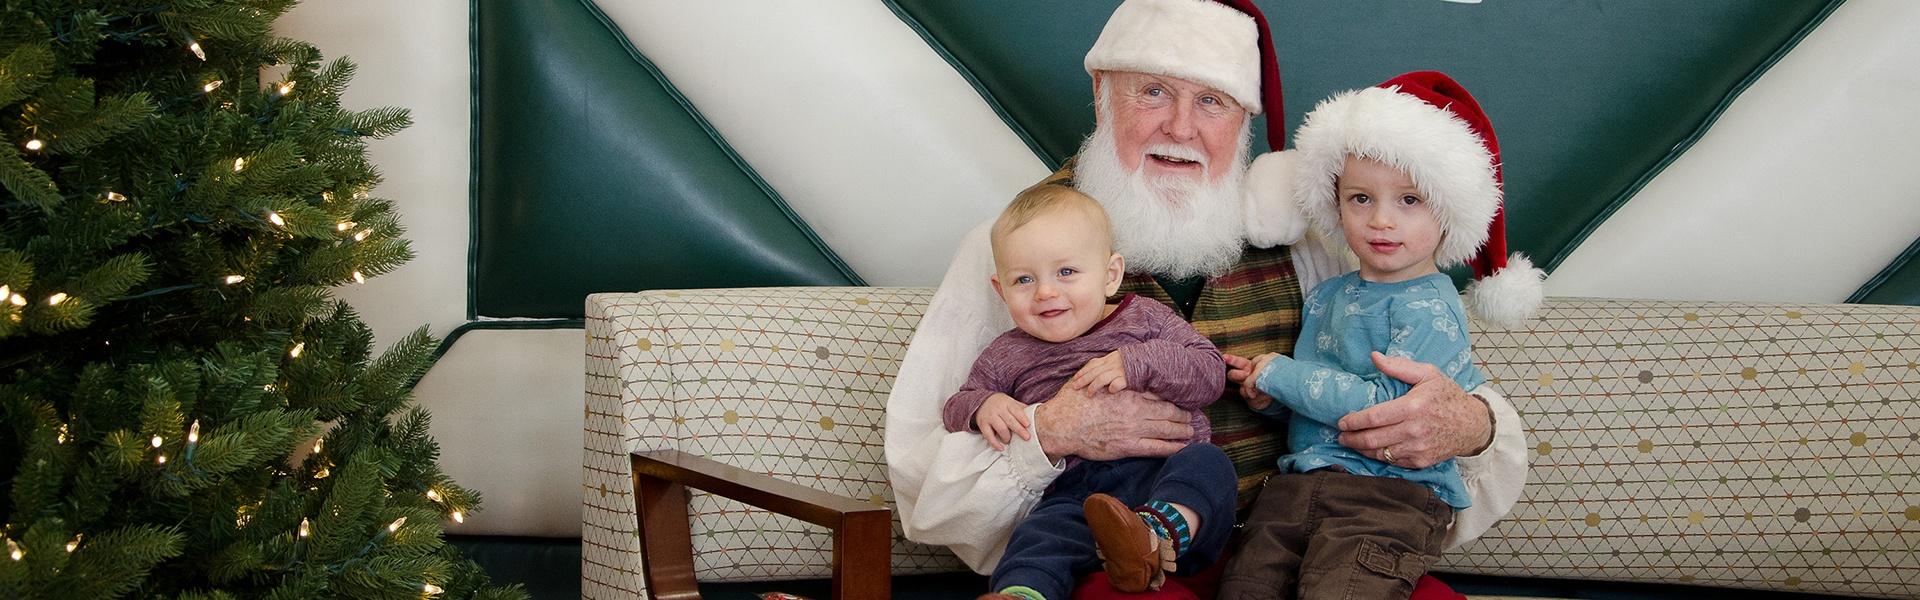 Preschool Christmas Party • Thursday, December 19, 9:00am–11:00am